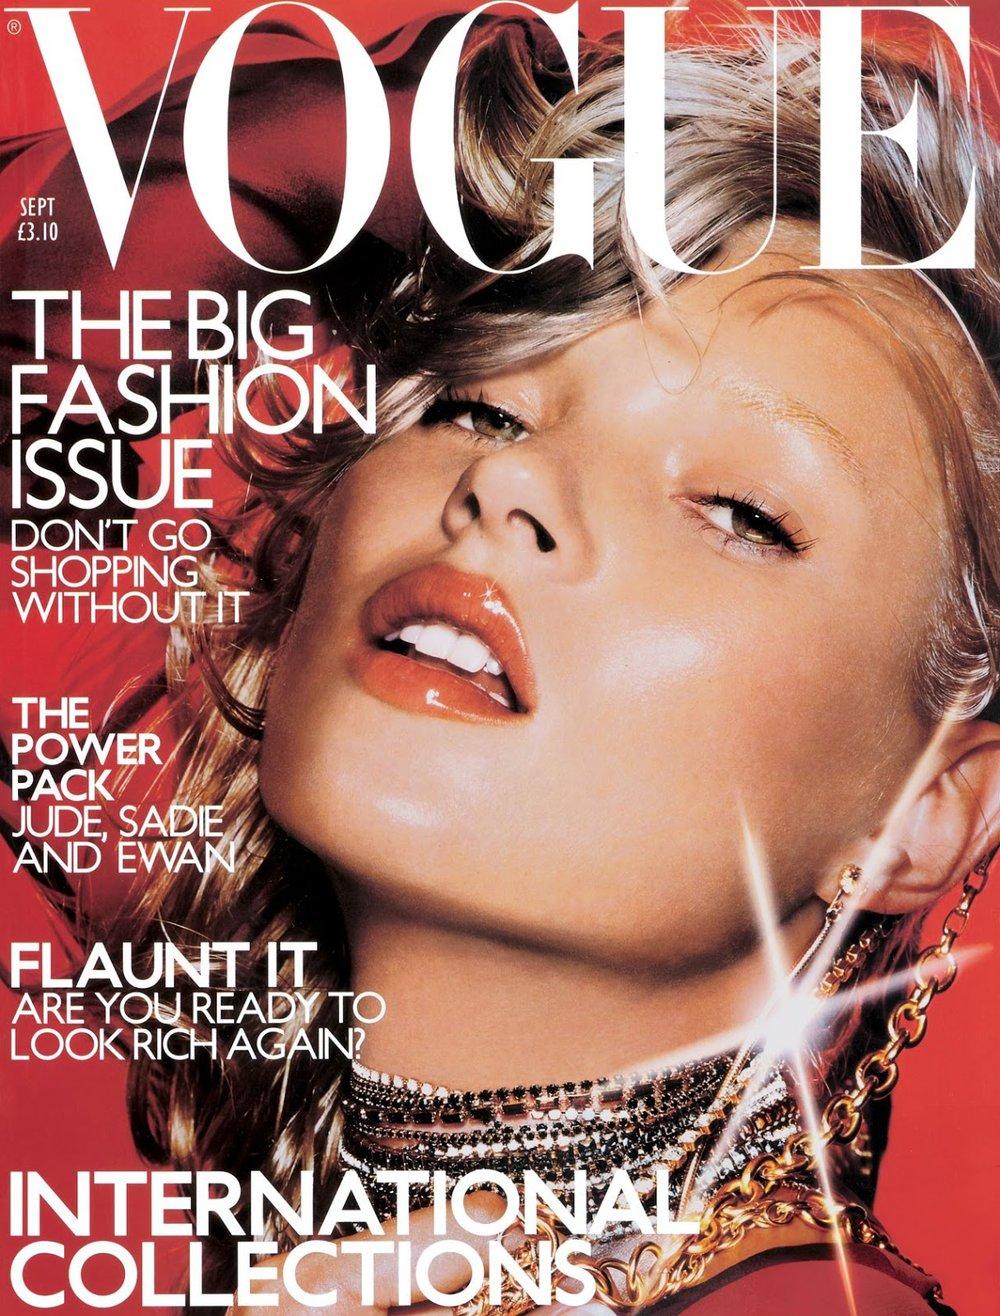 British Vogue September 2000